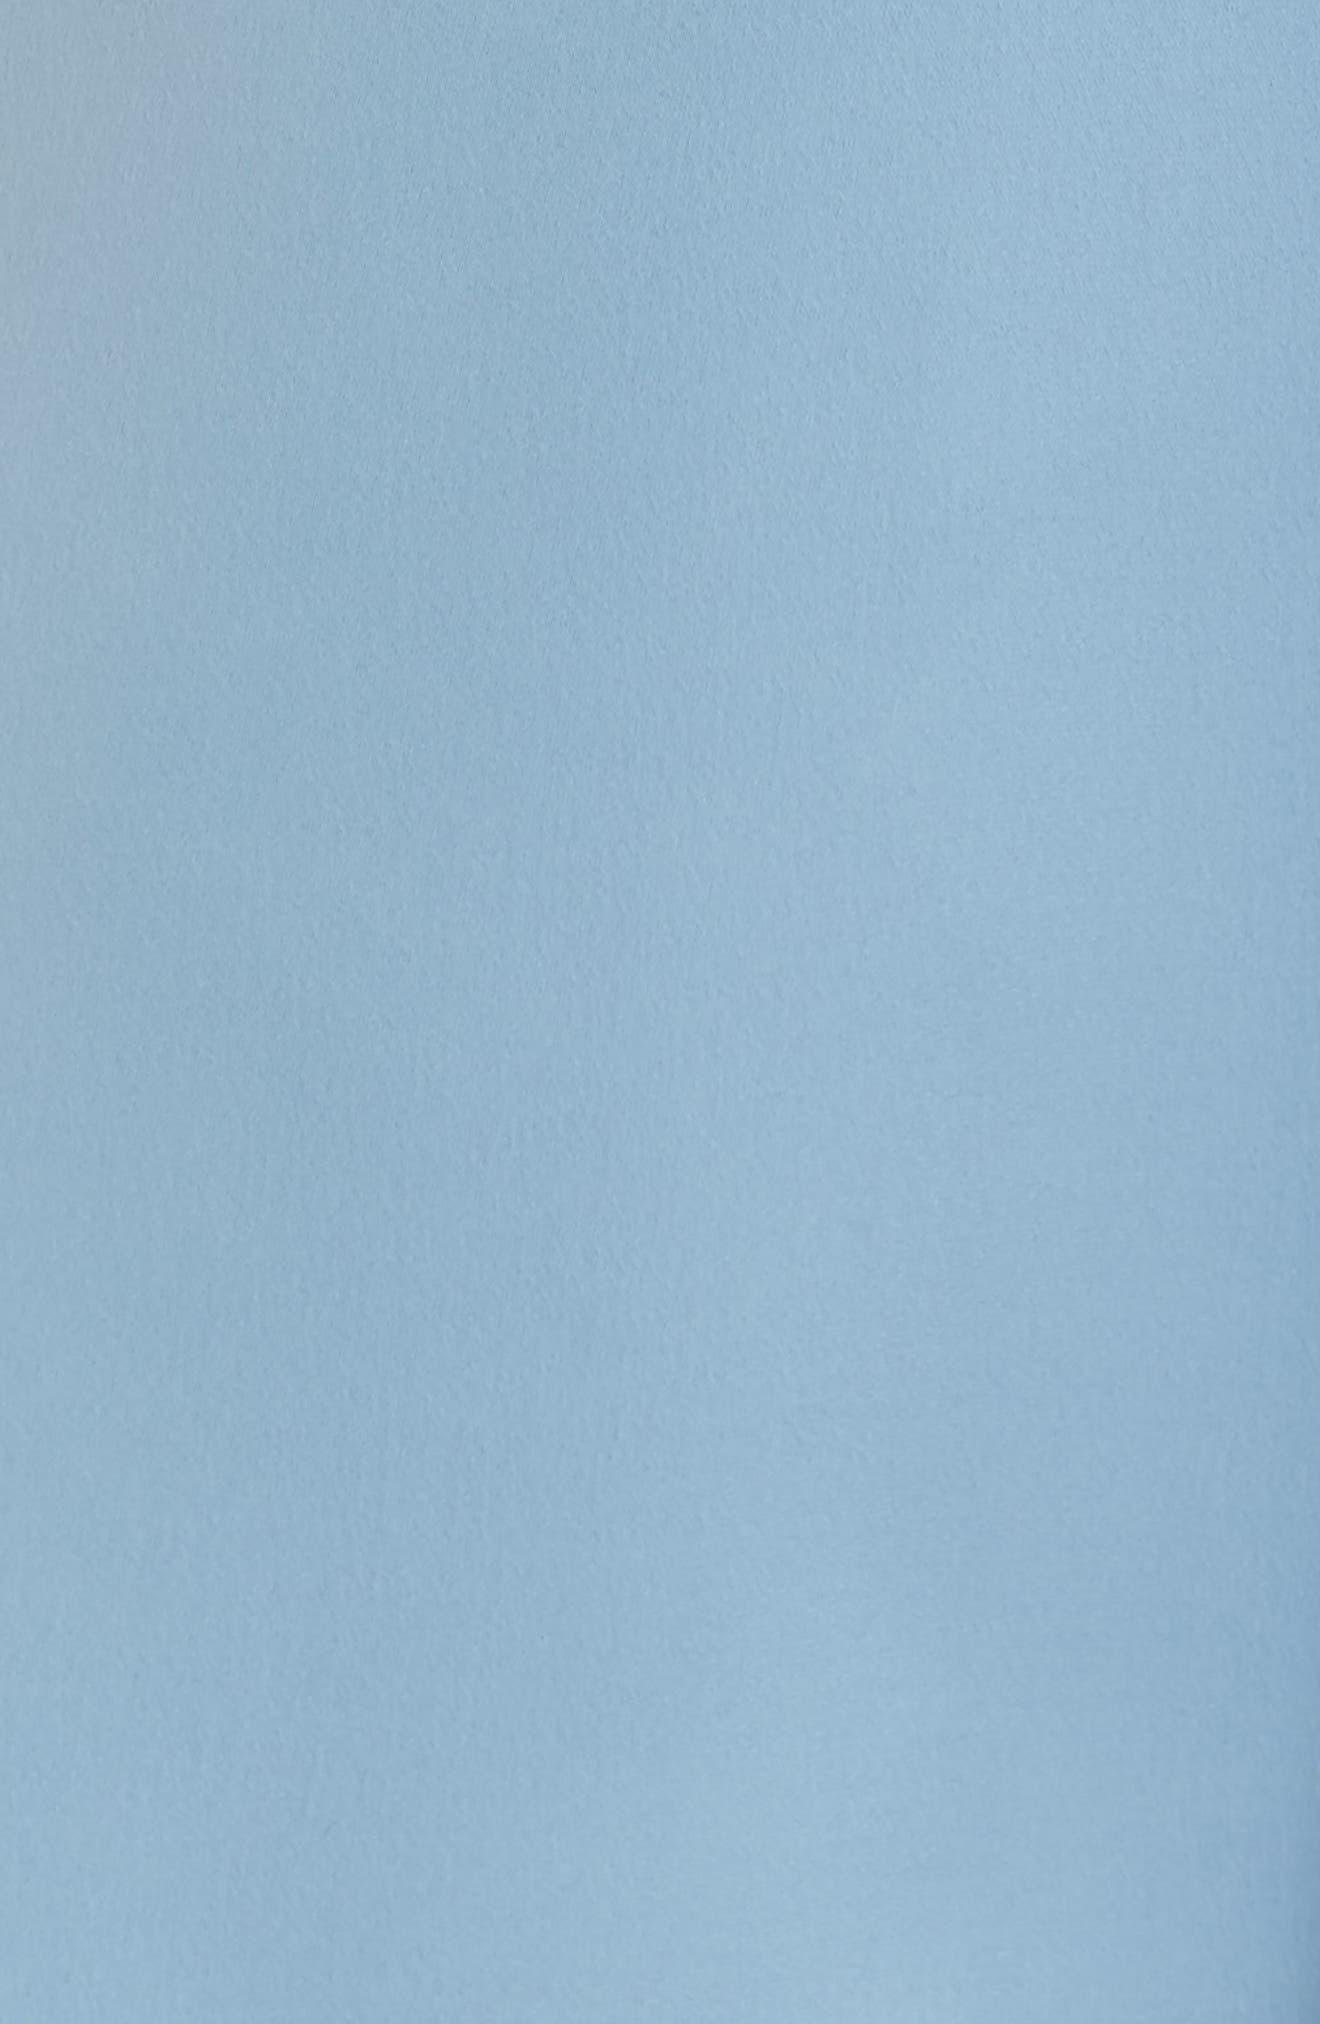 Marilyn Satin Fit & Flare Dress,                             Alternate thumbnail 7, color,                             Cornflower